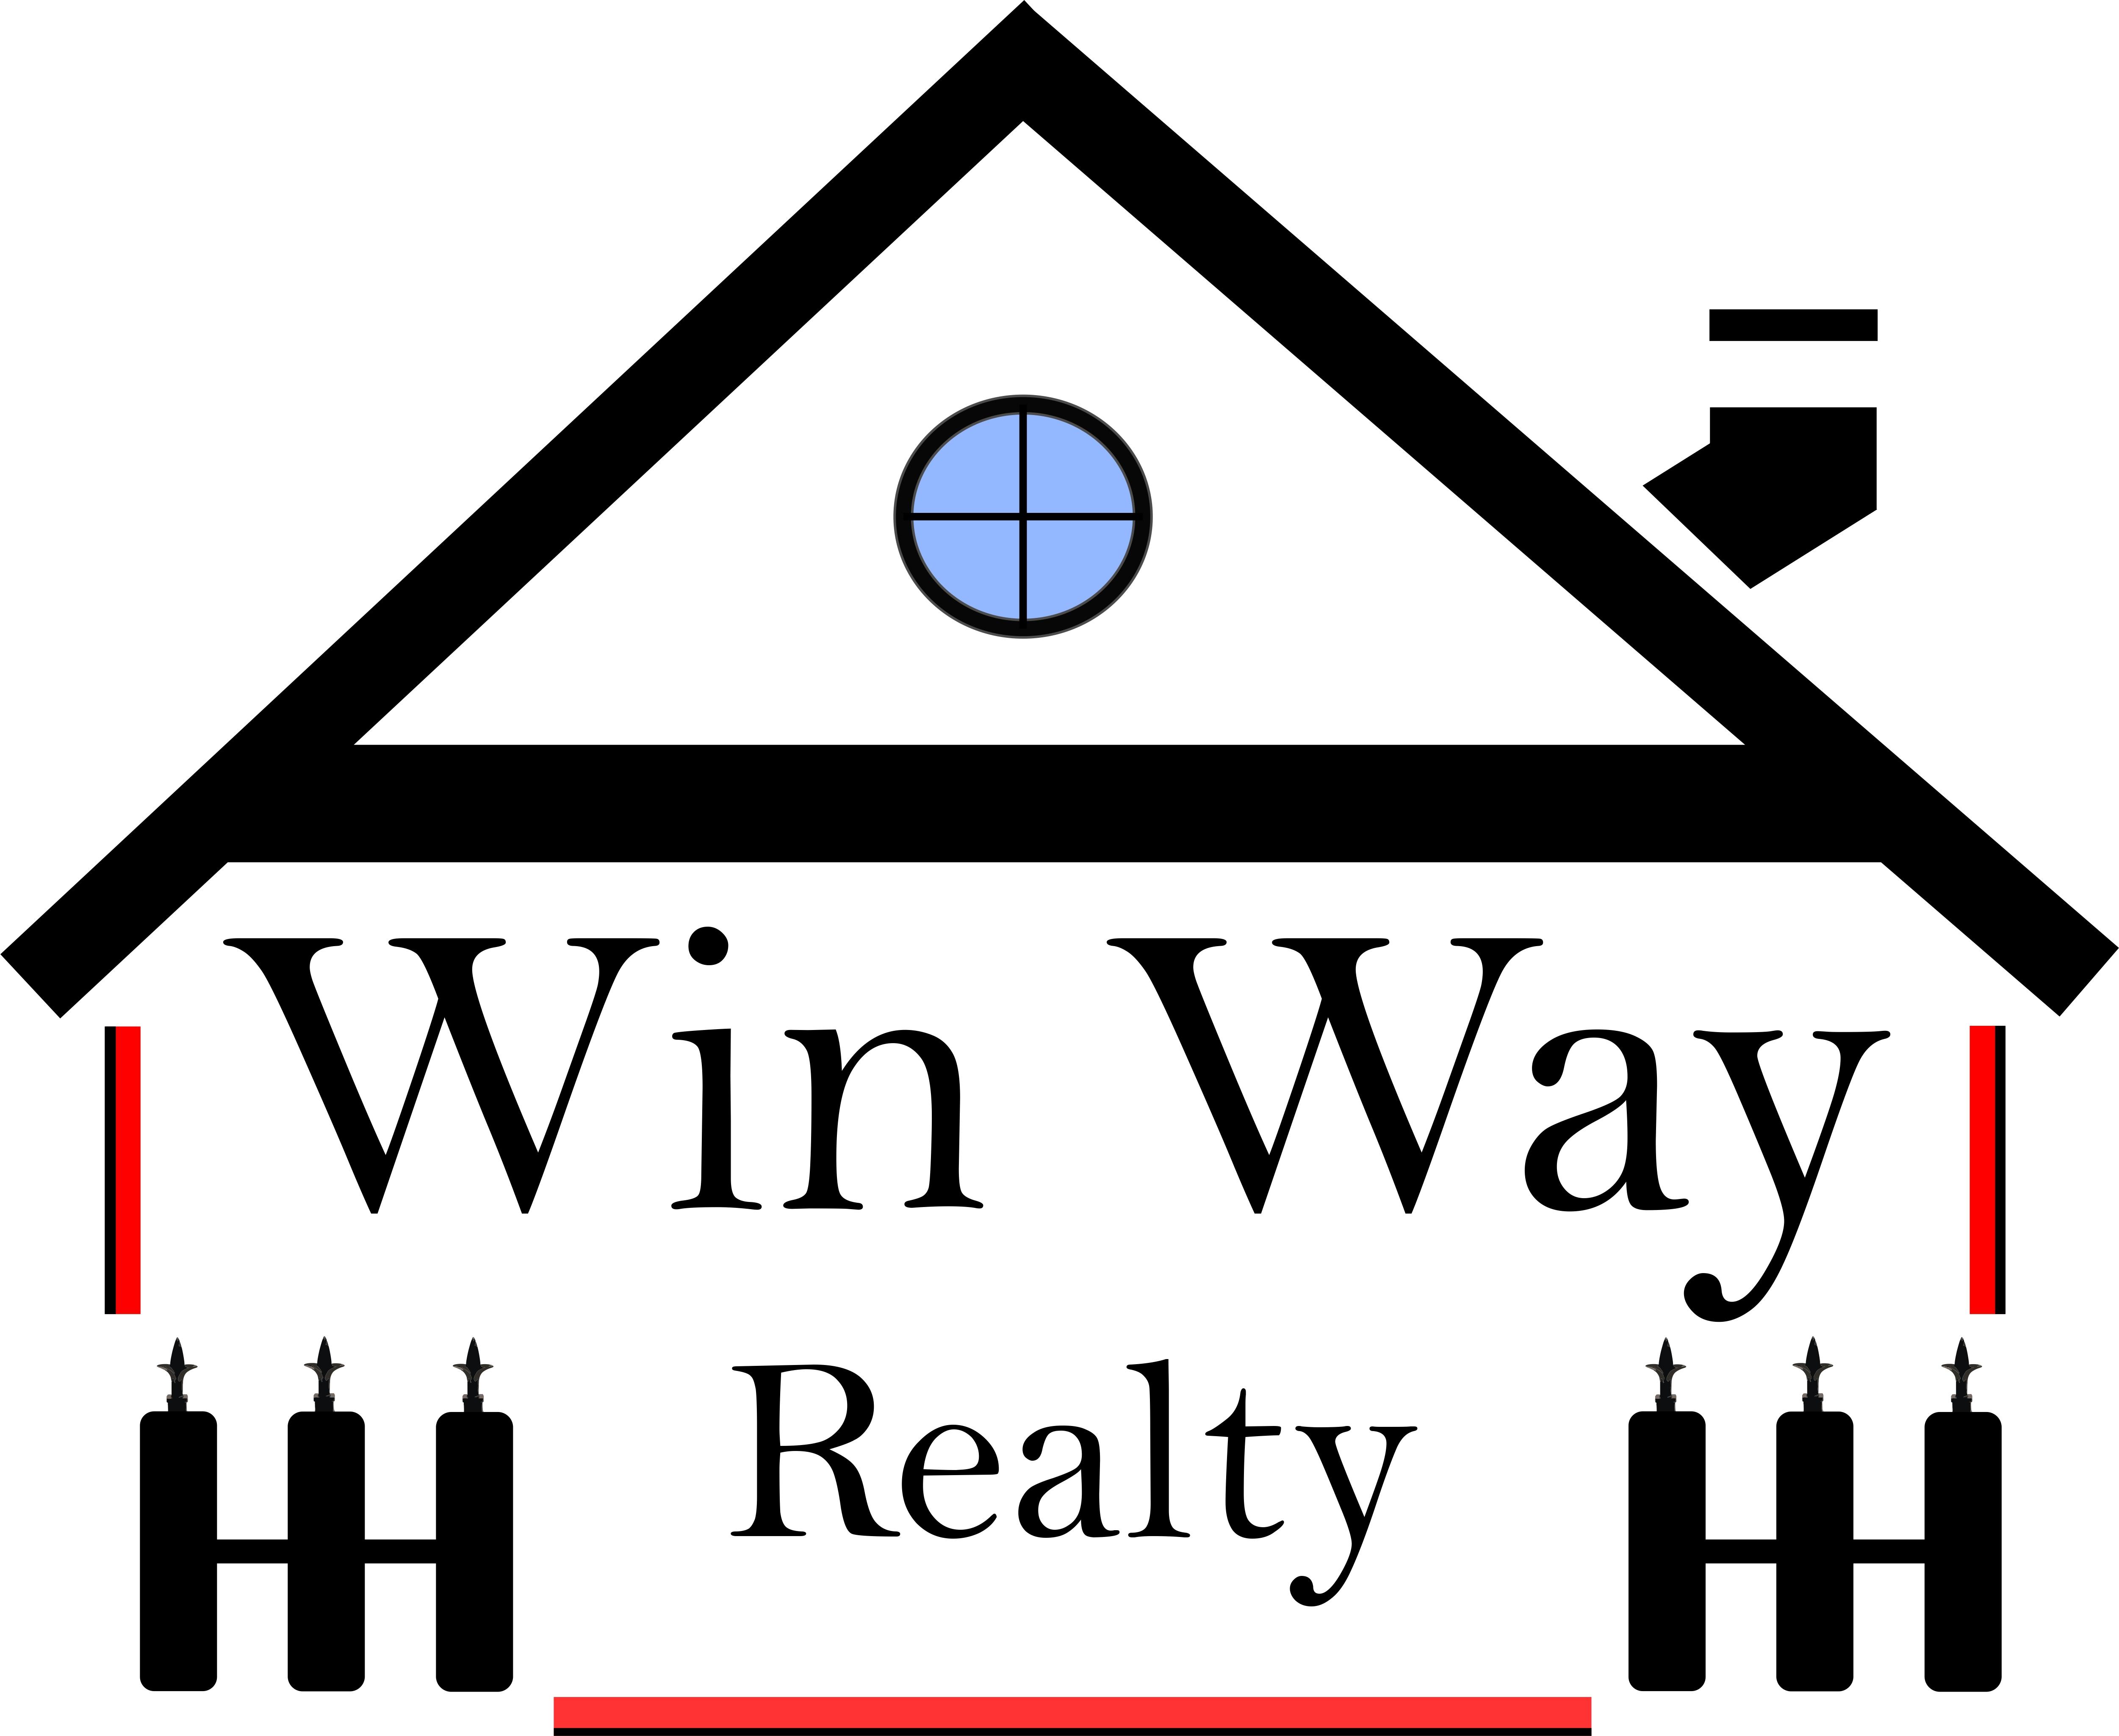 Логотип для агентства недвижимости фото f_8625aa87acac5432.jpg